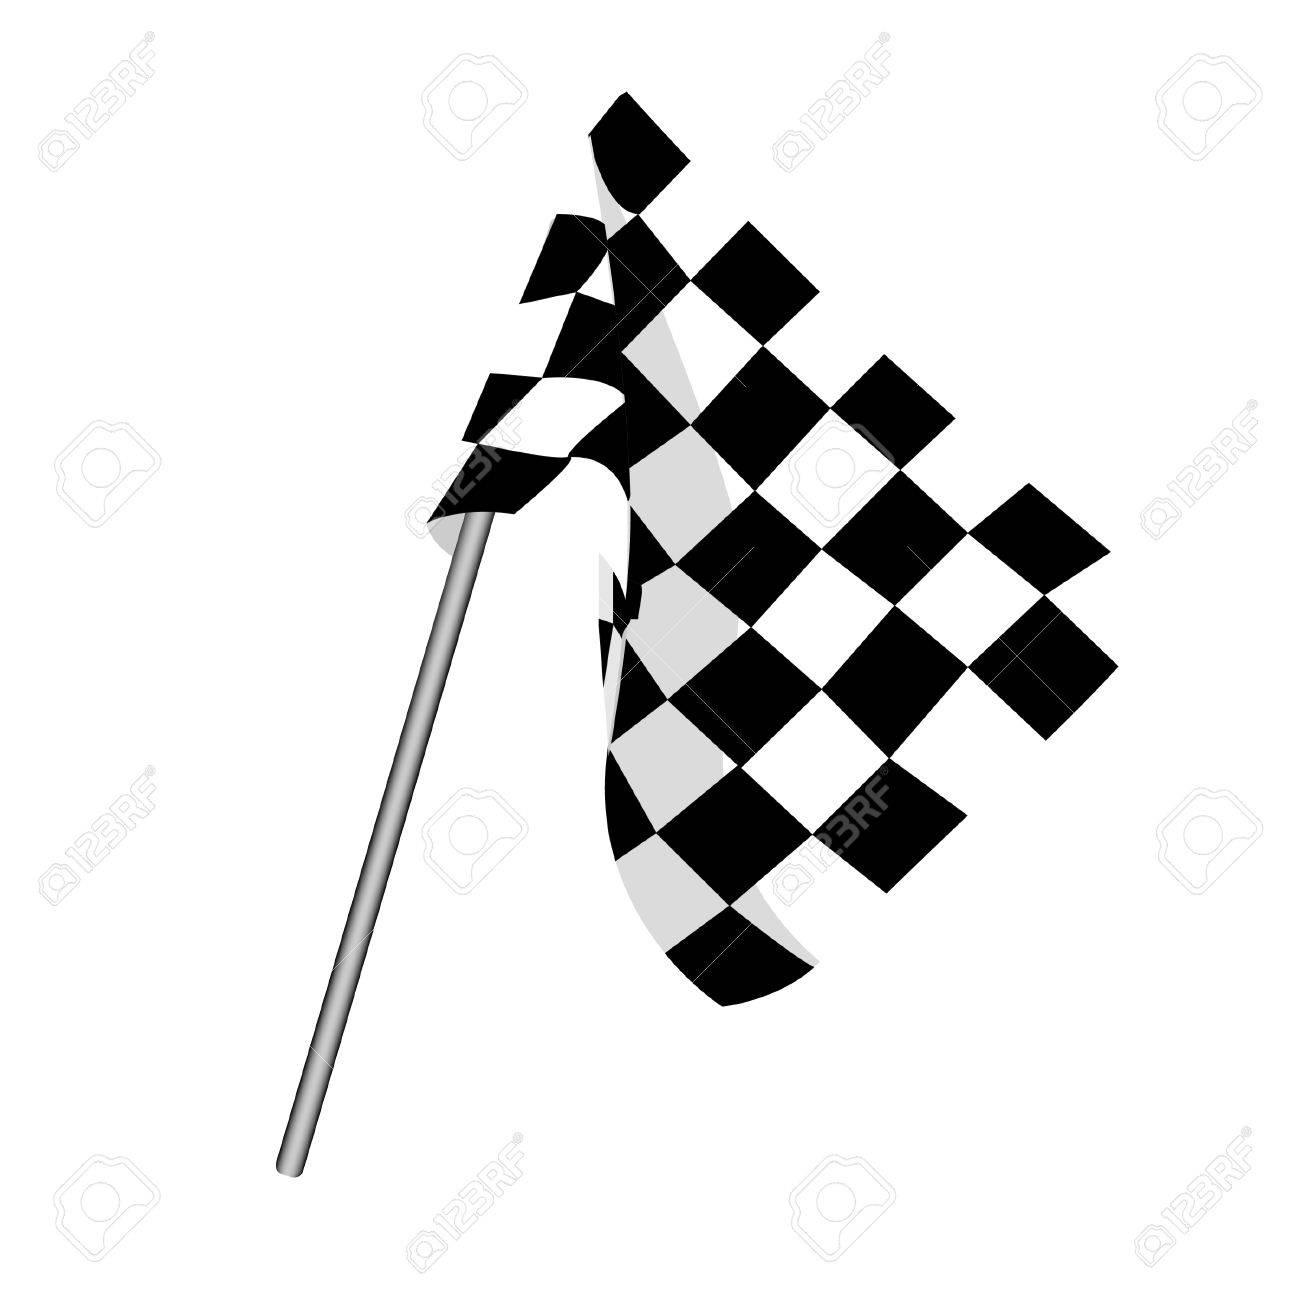 start flag checkered flag finish flag racing flag royalty free